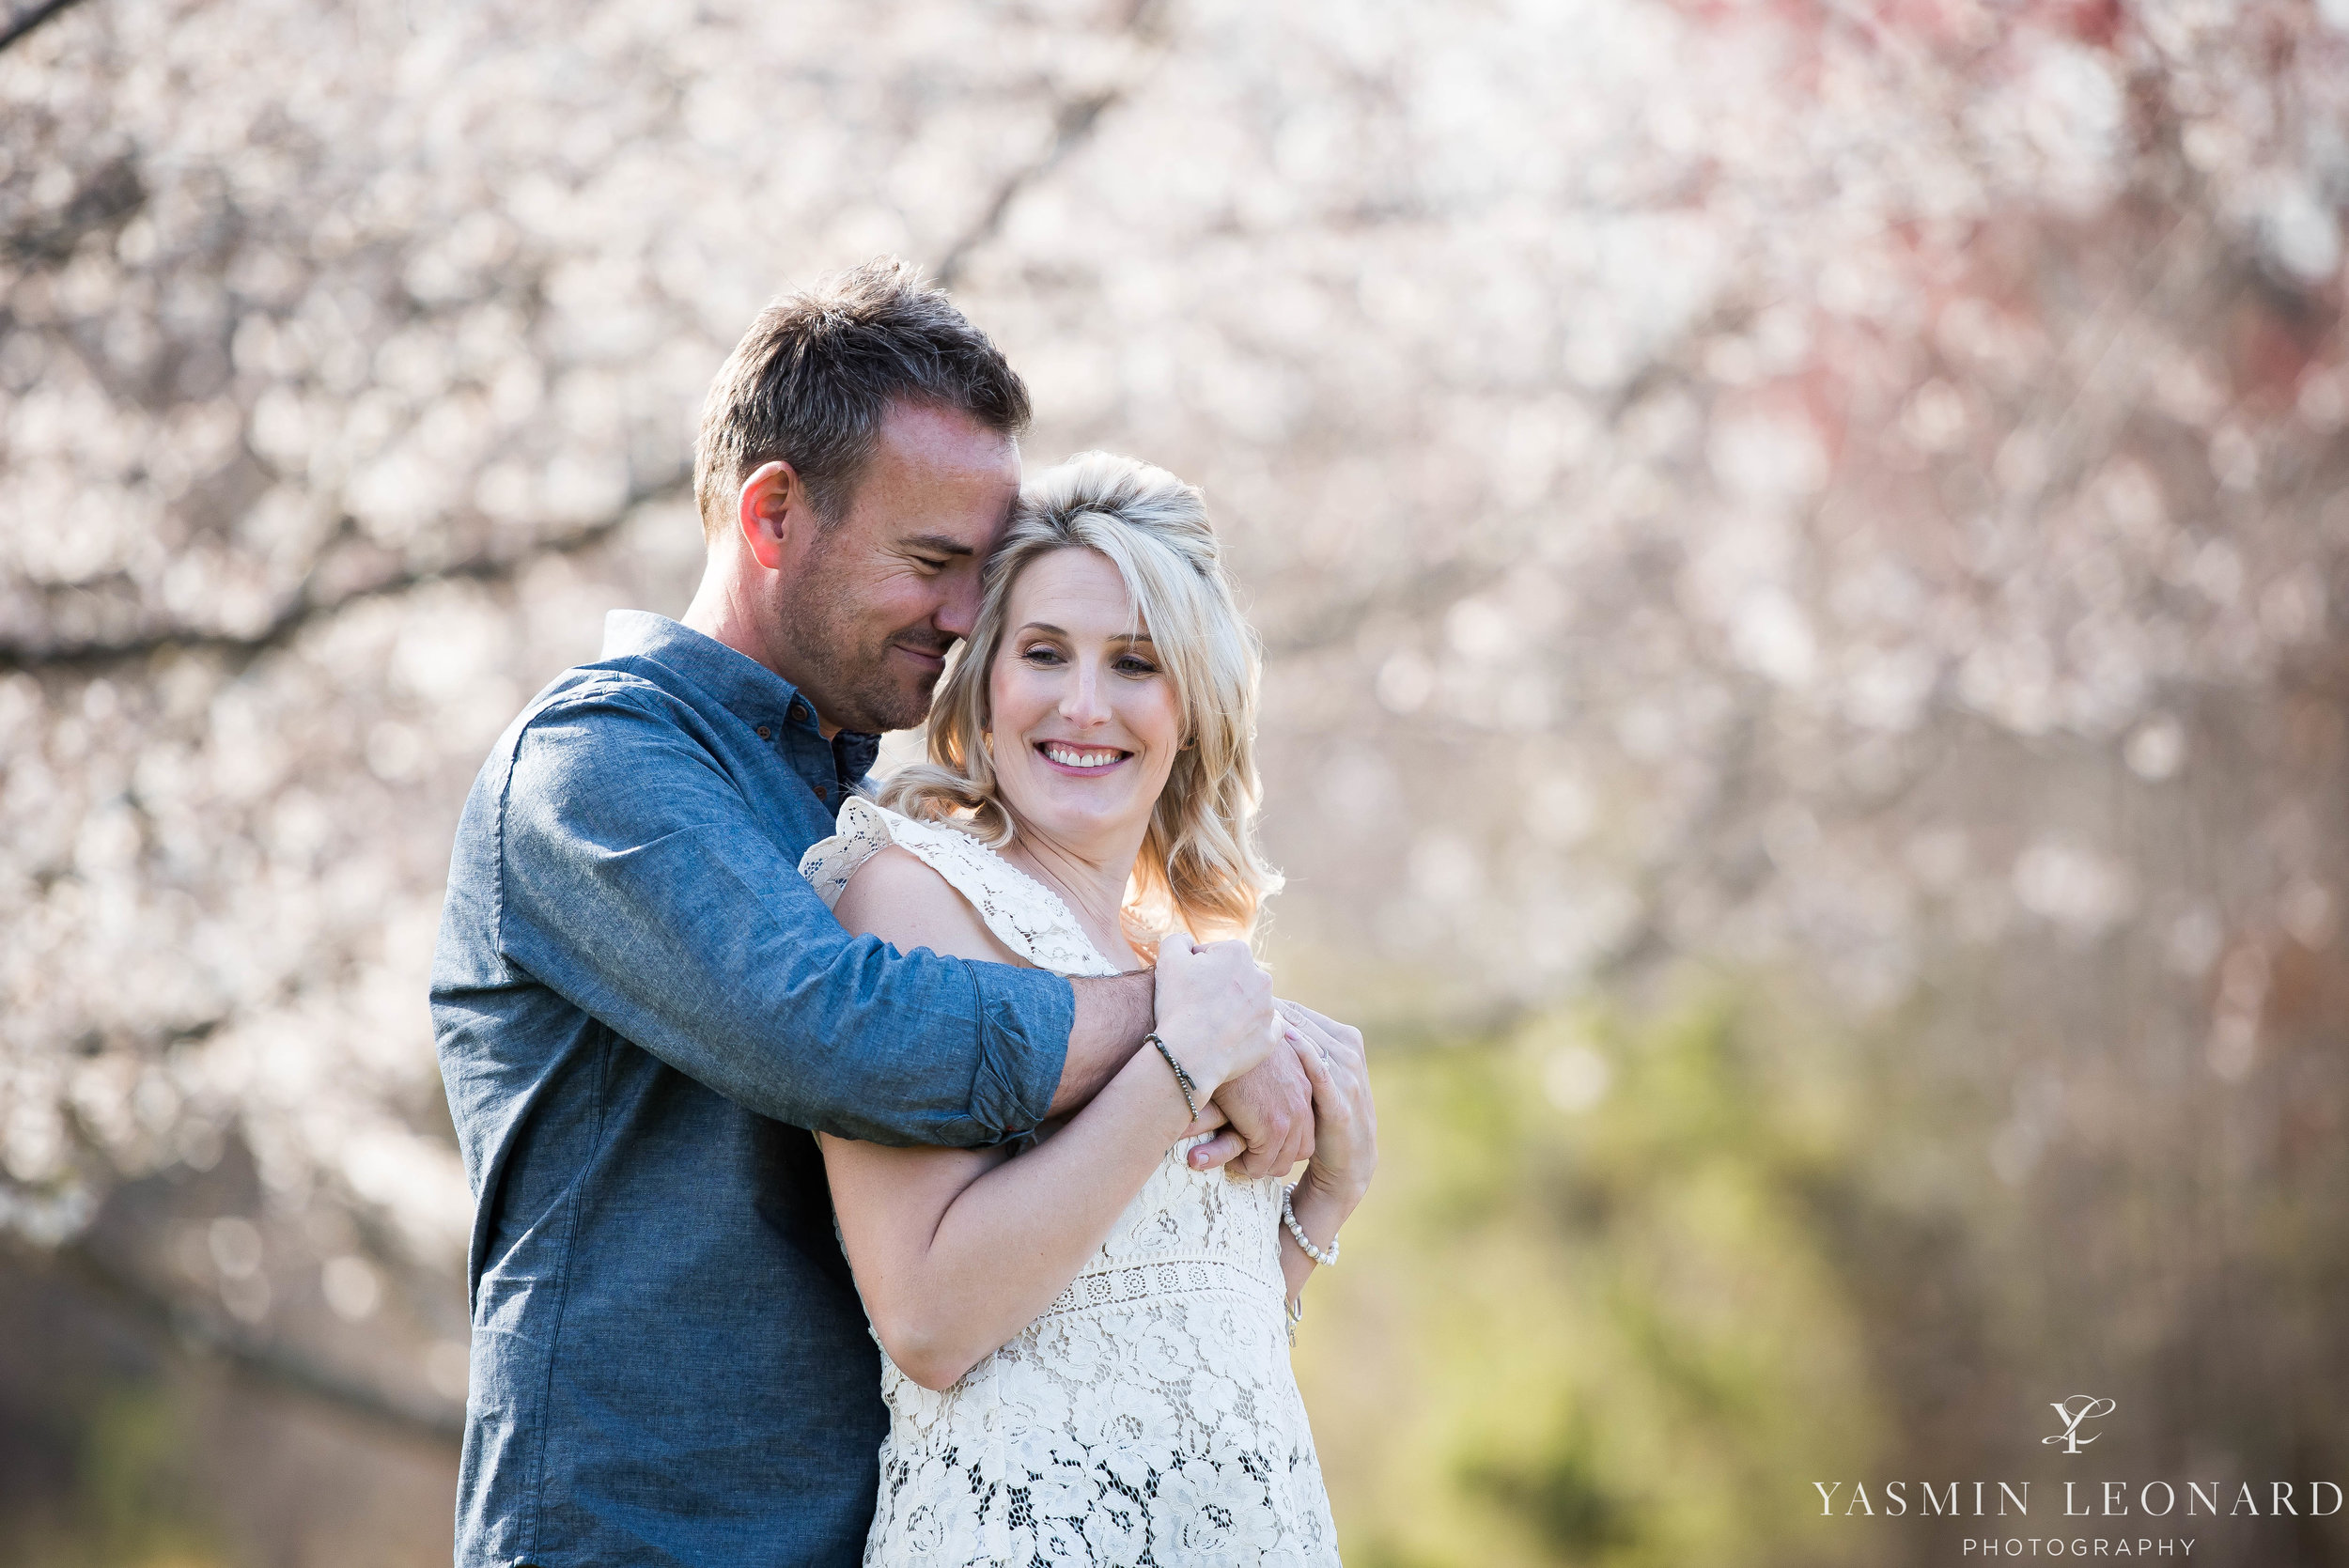 High Point Wedding Photographer - NC Wedding Photographer - Yasmin Leonard Photography - Engagement Poses - Engagement Ideas - Outdoor Engagement Session-14.jpg